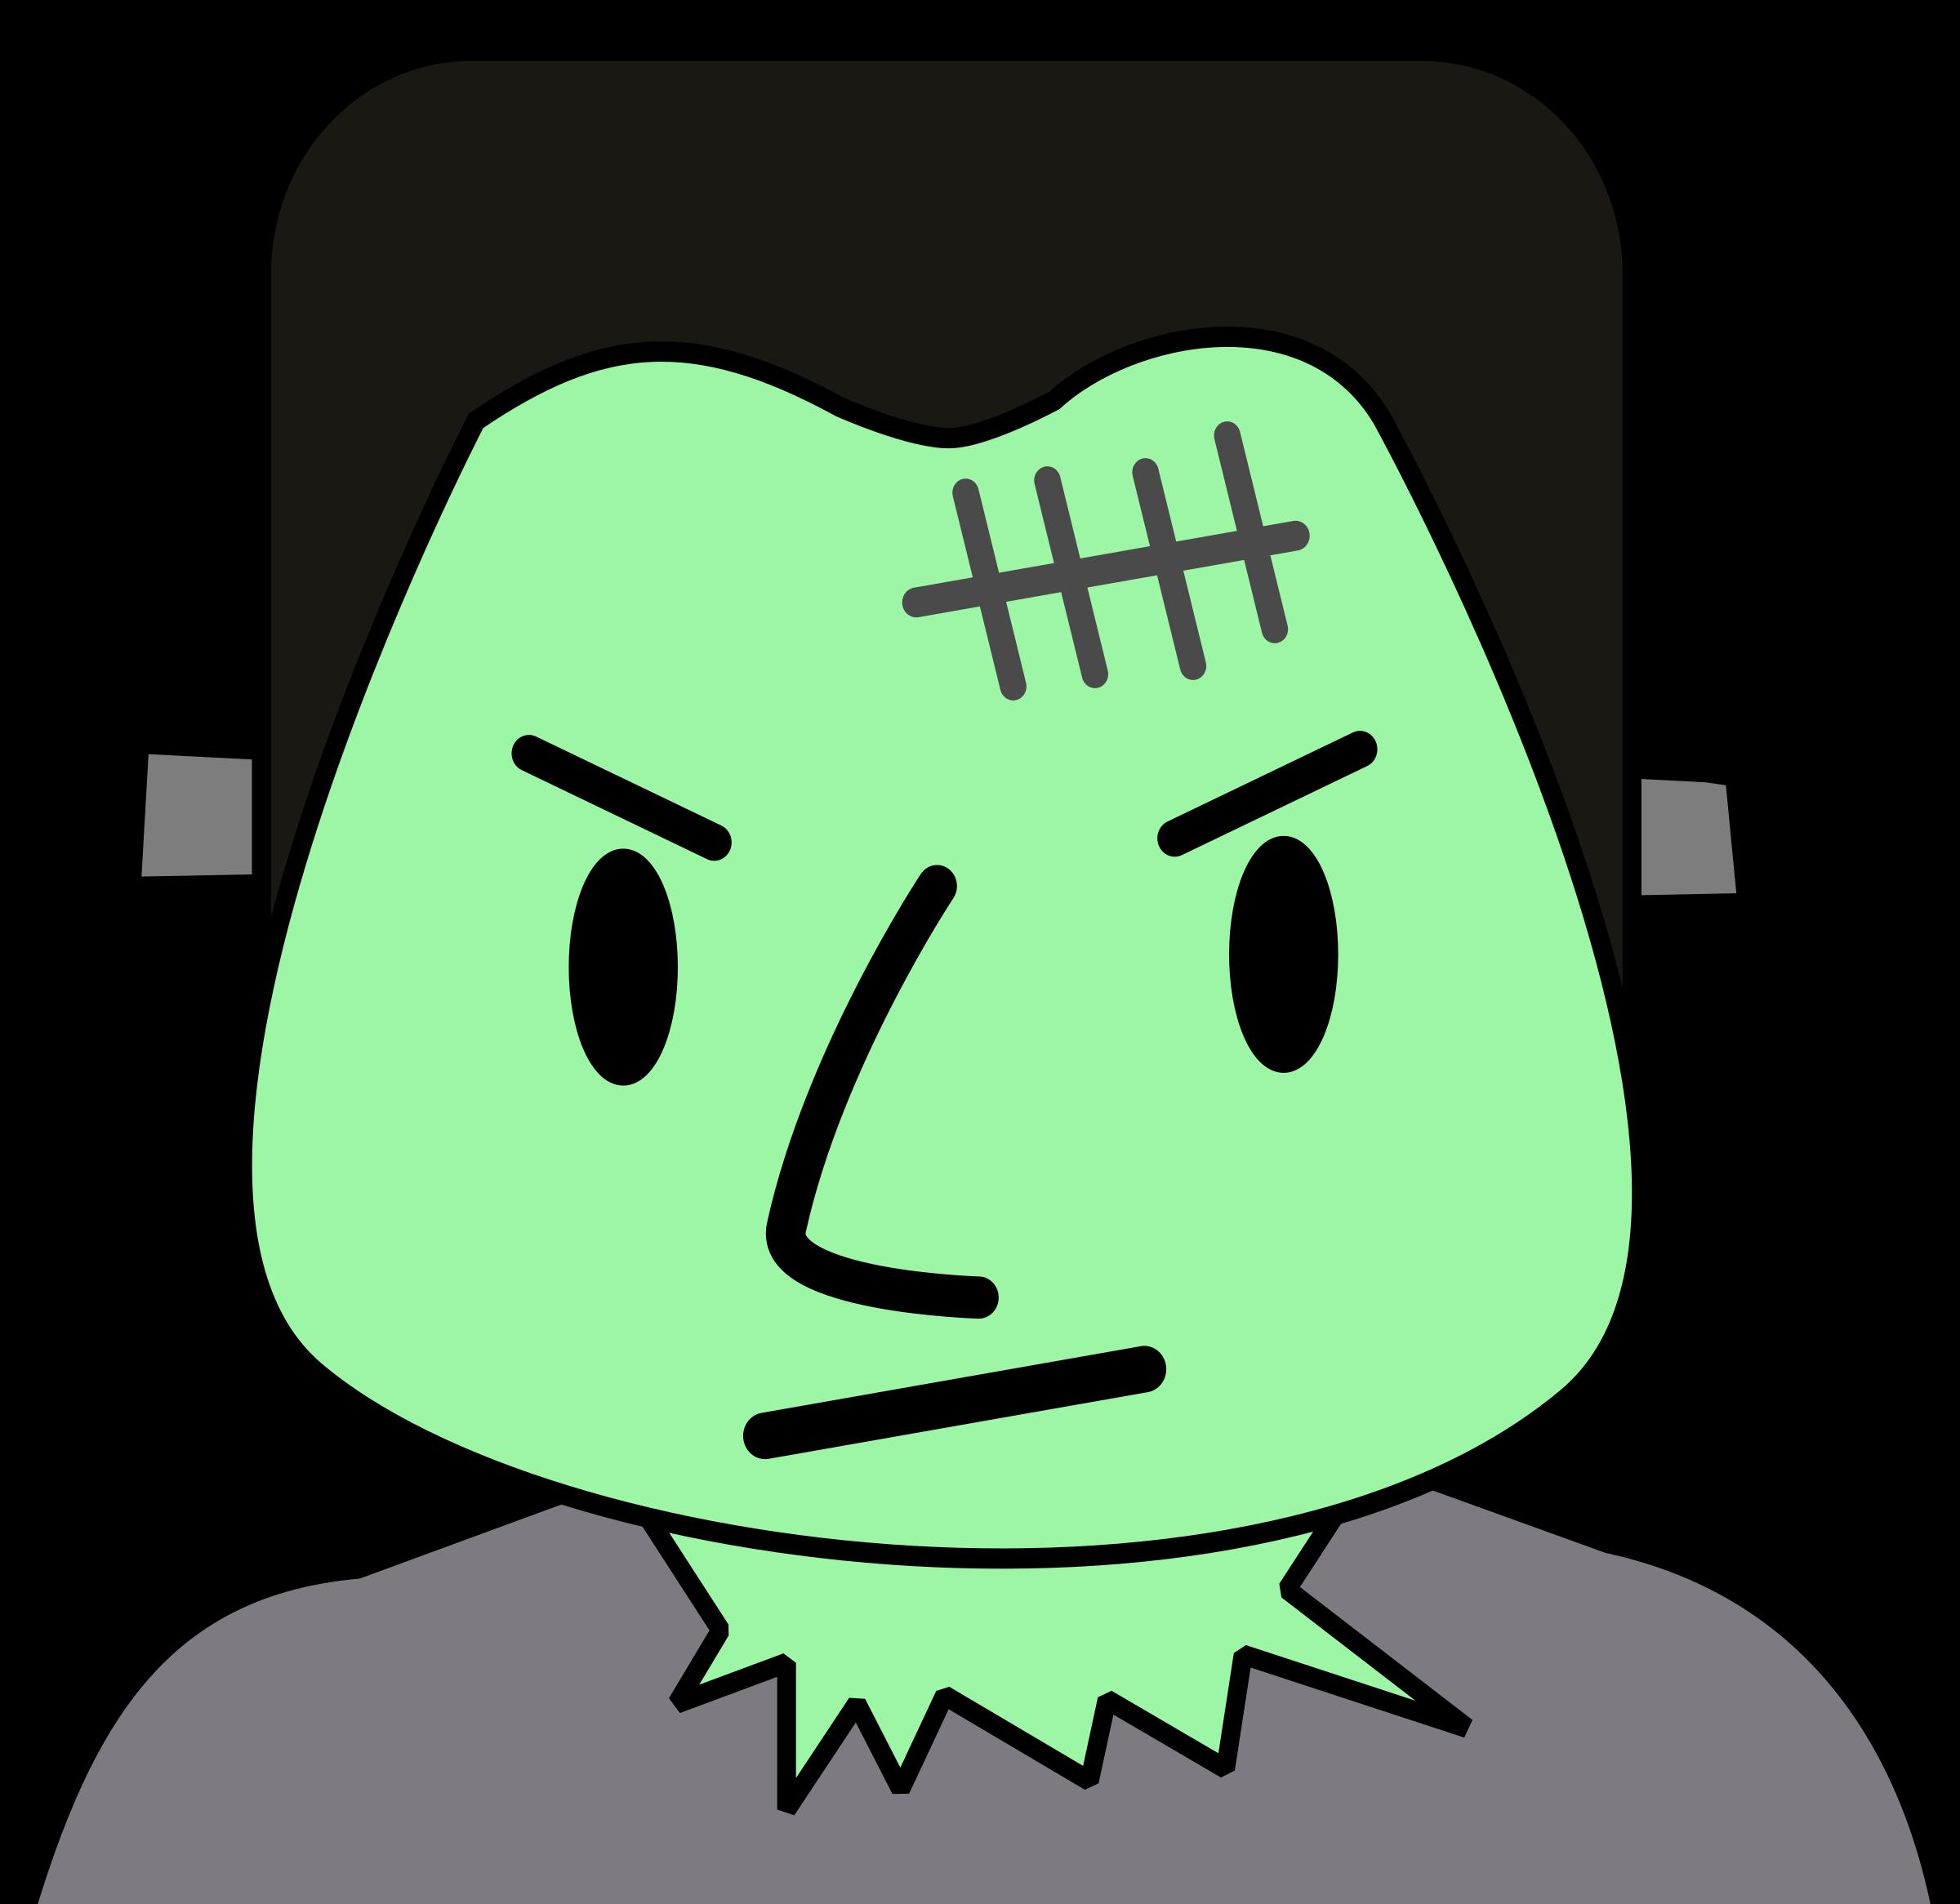 Monster guy big image. Frankenstein clipart green